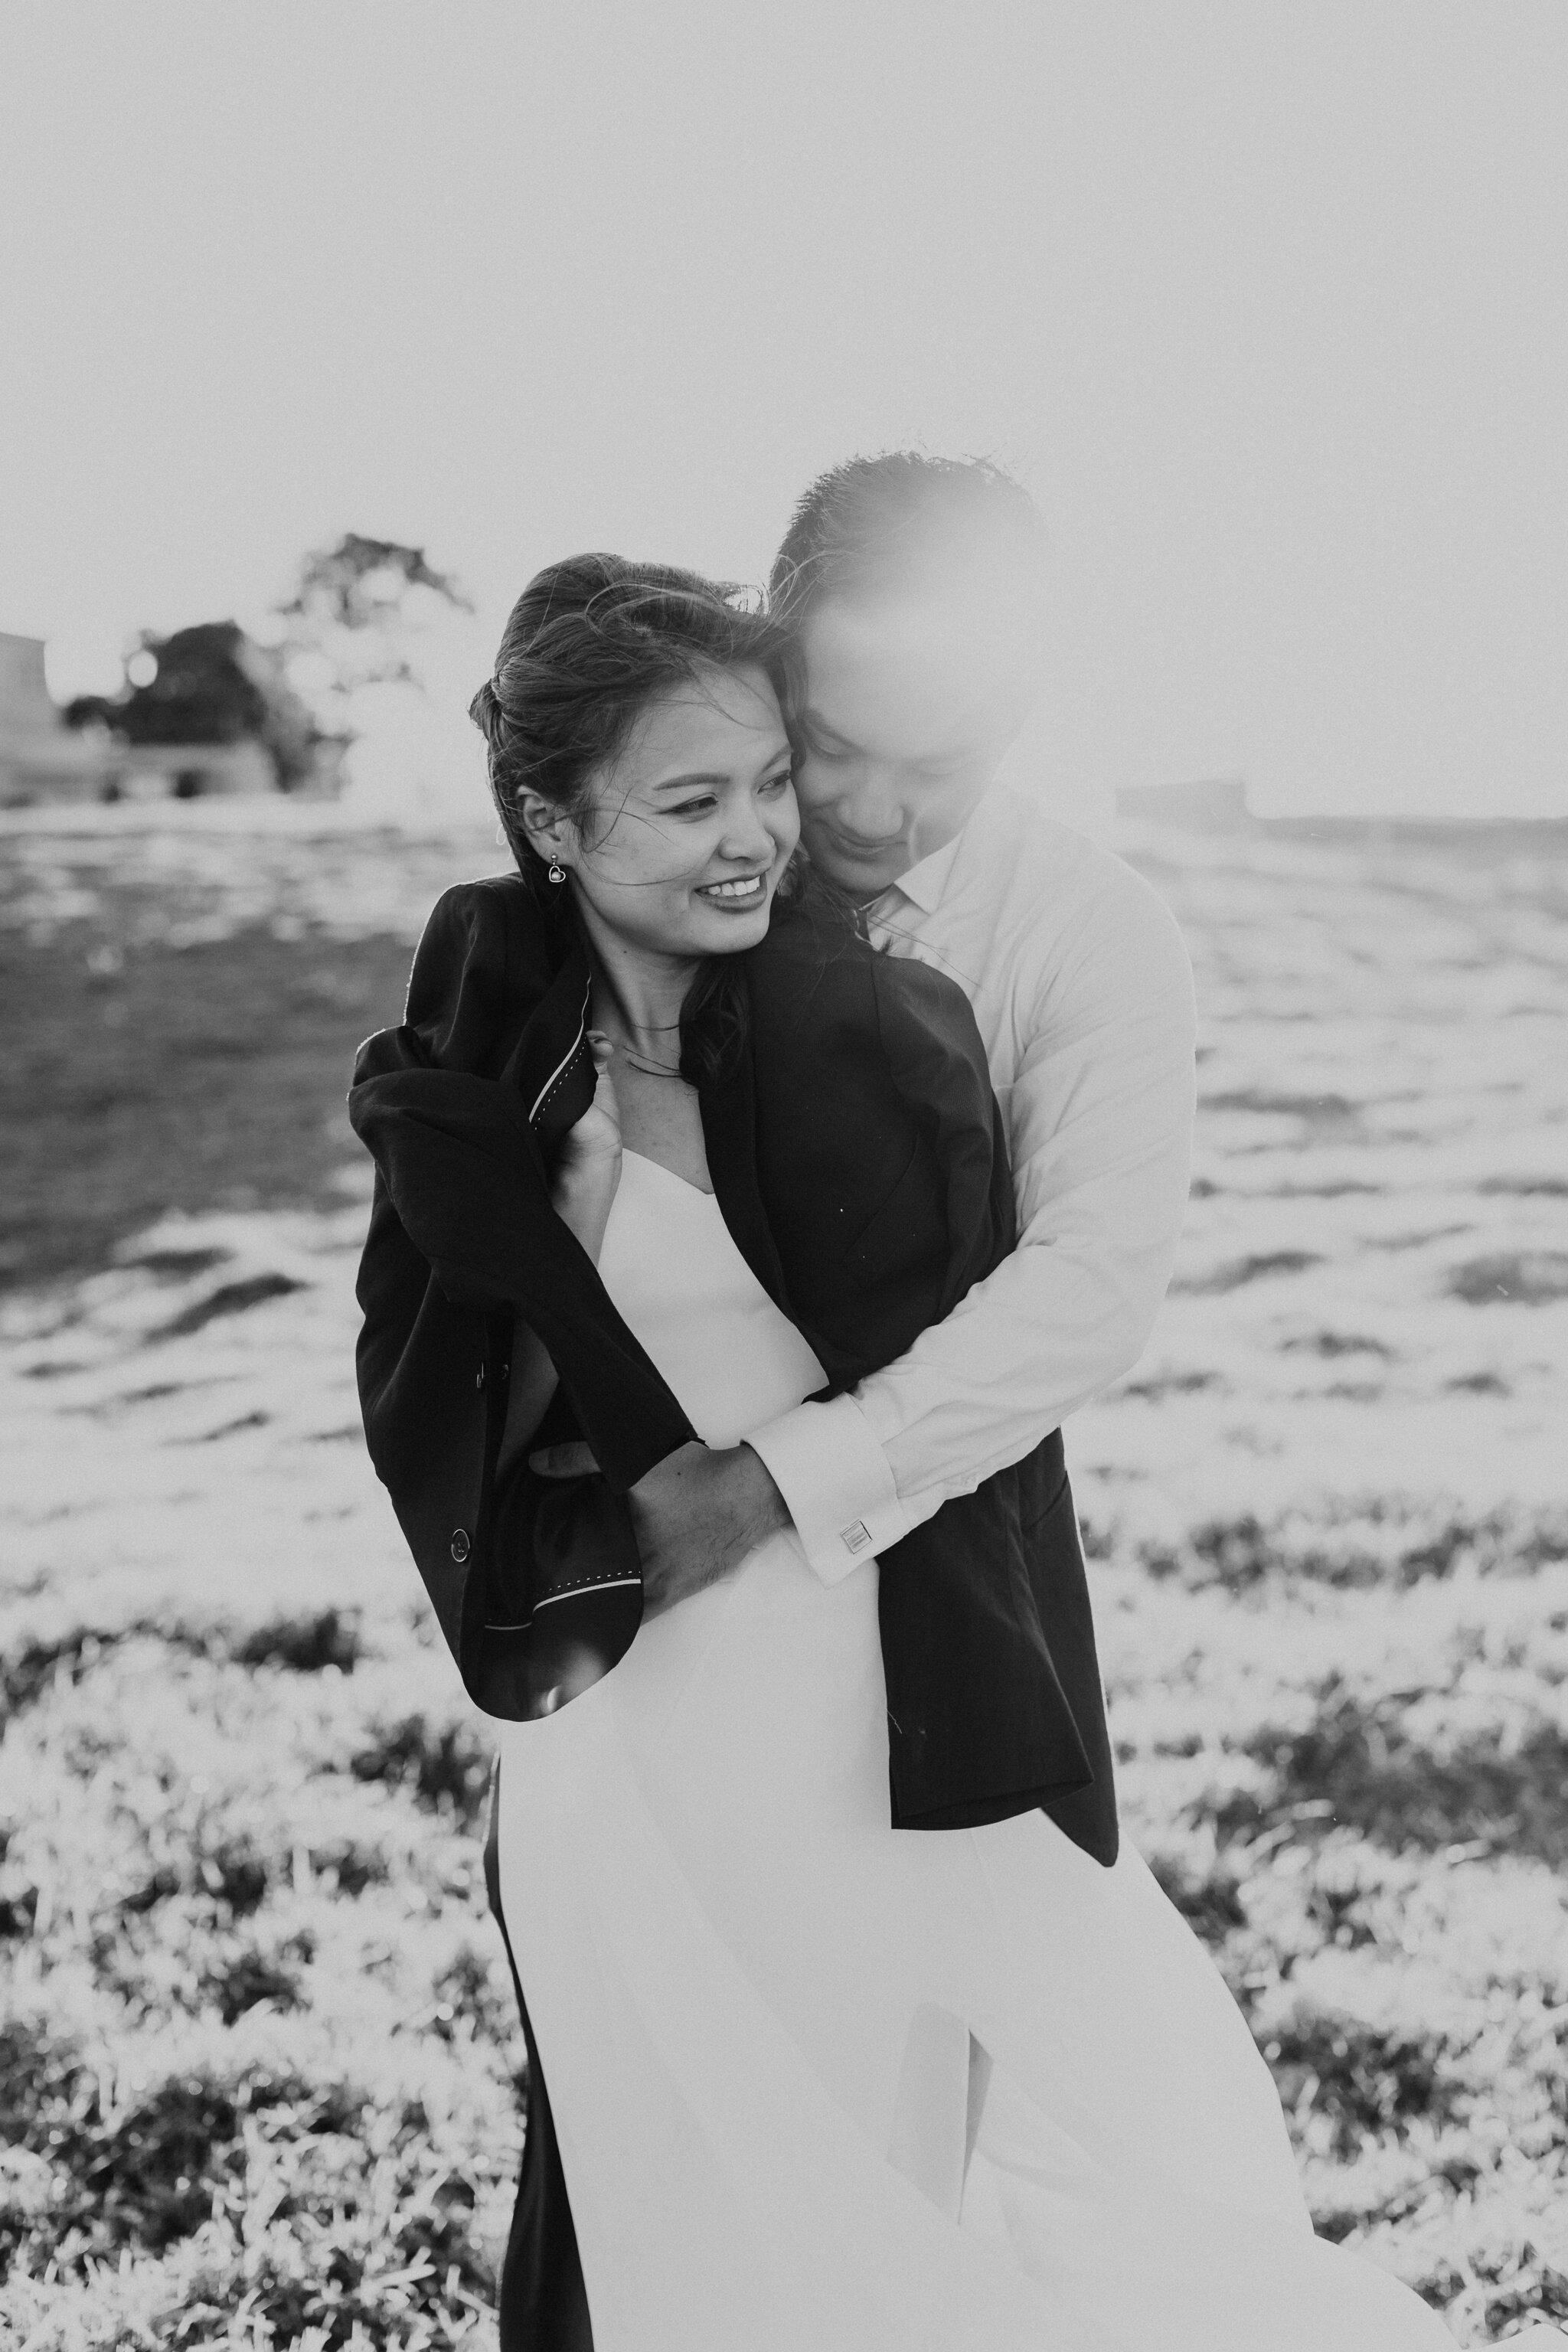 Maleny One Tree Hill Wedding - Maleny Wedding Photographer-7.jpg